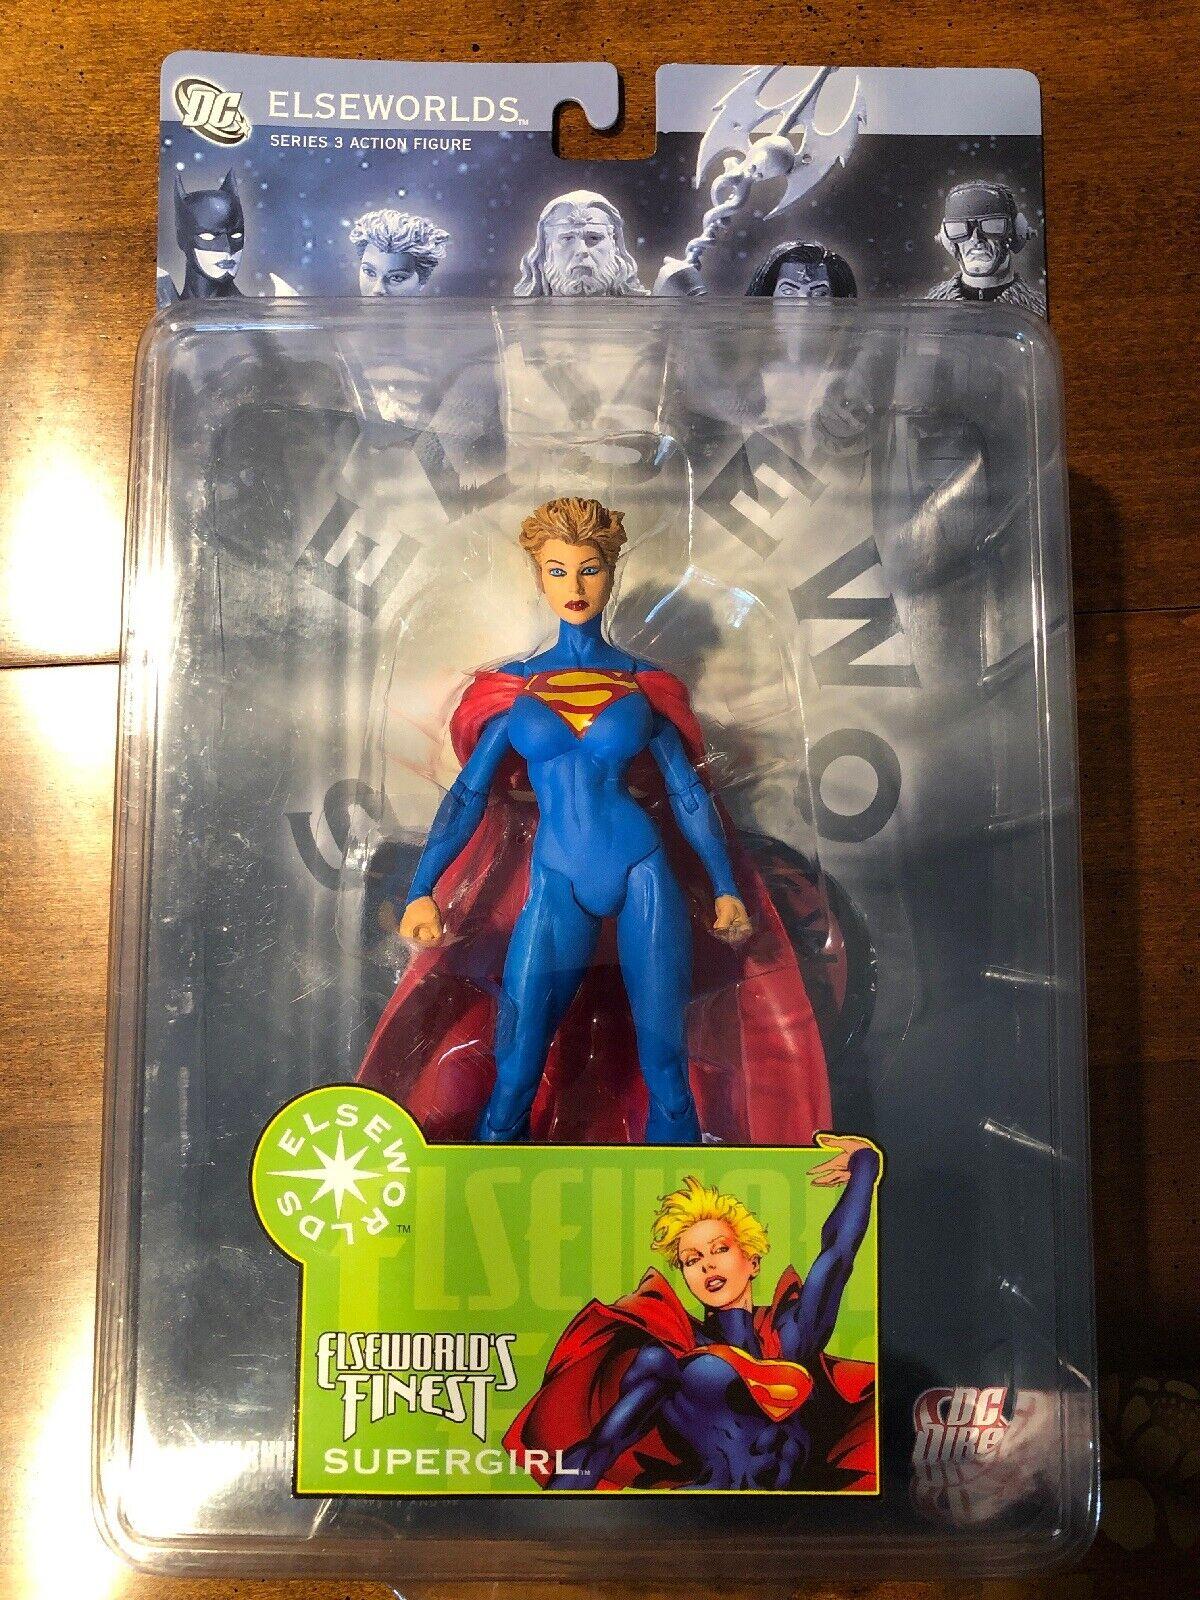 Impresionante Elseworlds mejores serie 3 súpergirl 6in Figura de Acción Juguetes DC Direct